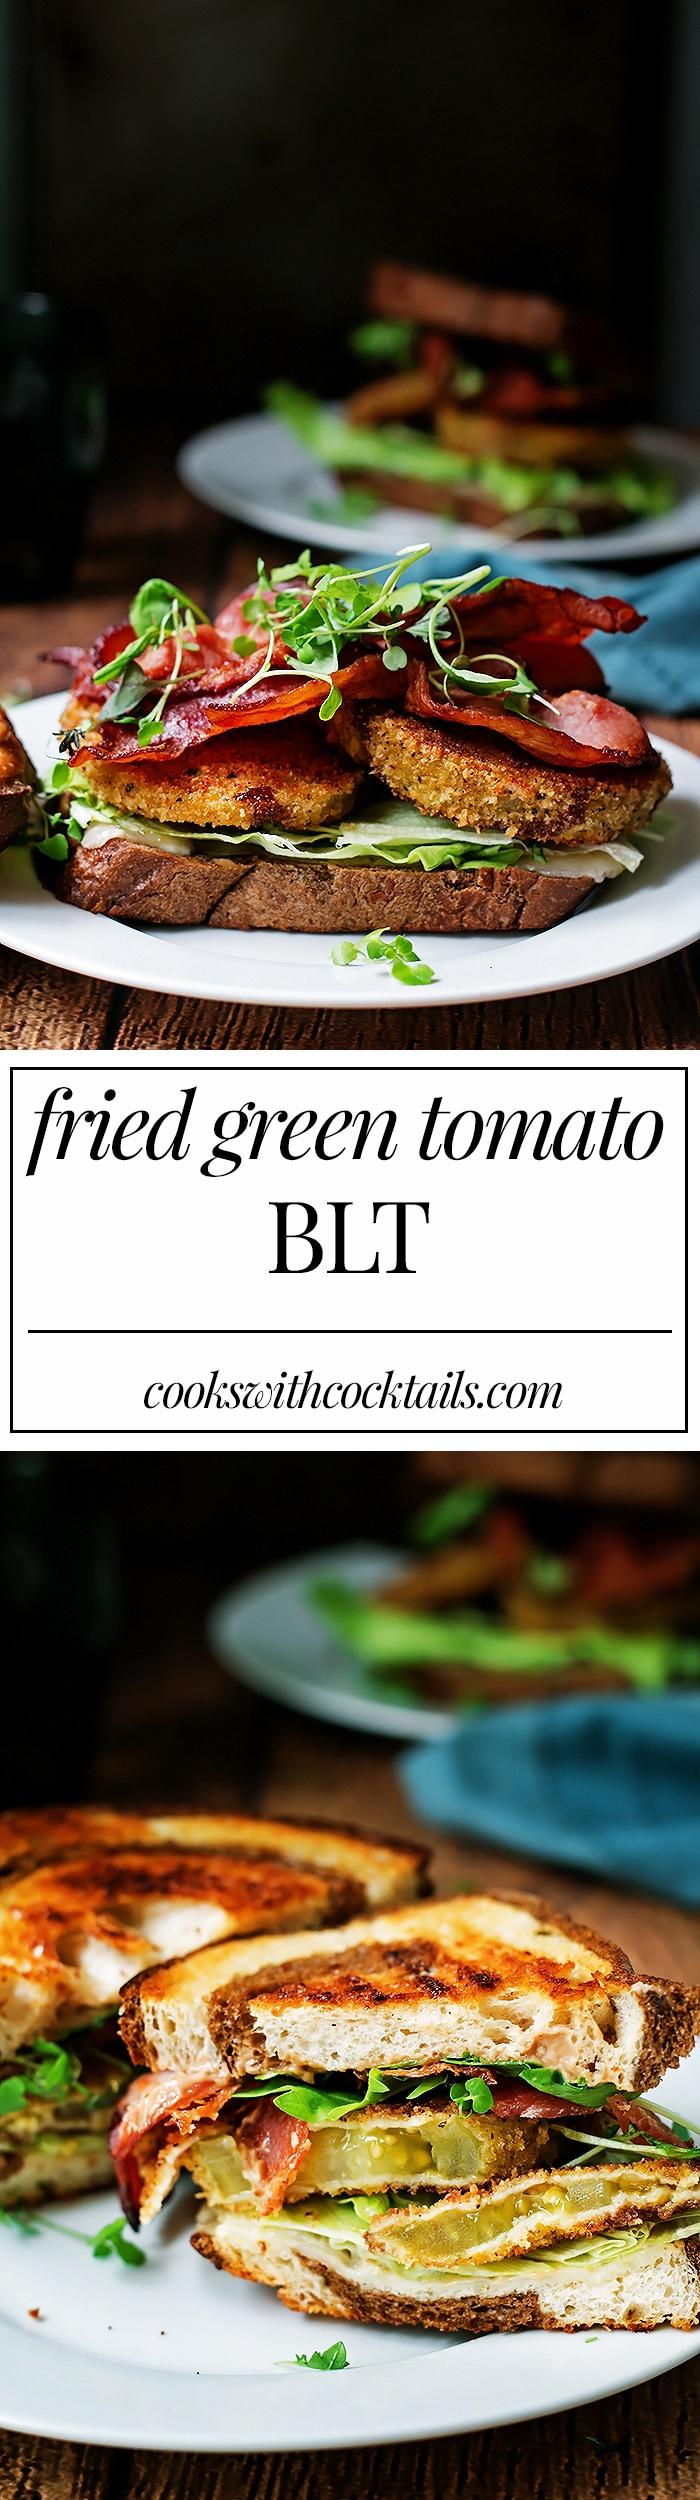 Fried Green Tomato BLT